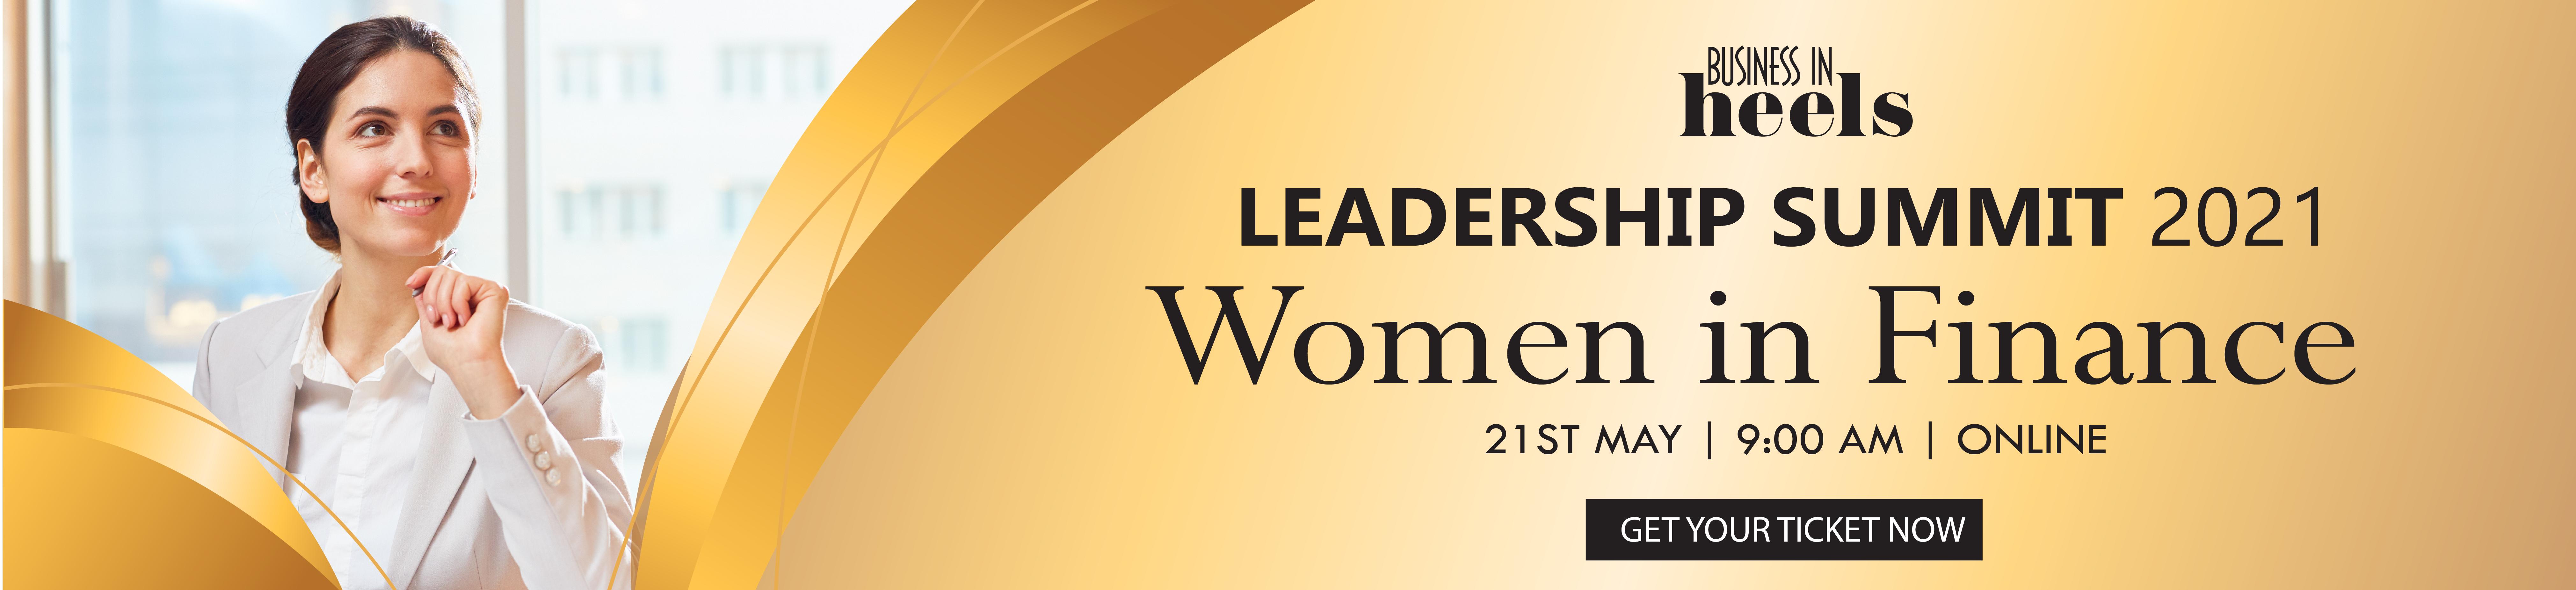 Leadership Summit Women in Finance Virtual Online Event workshops